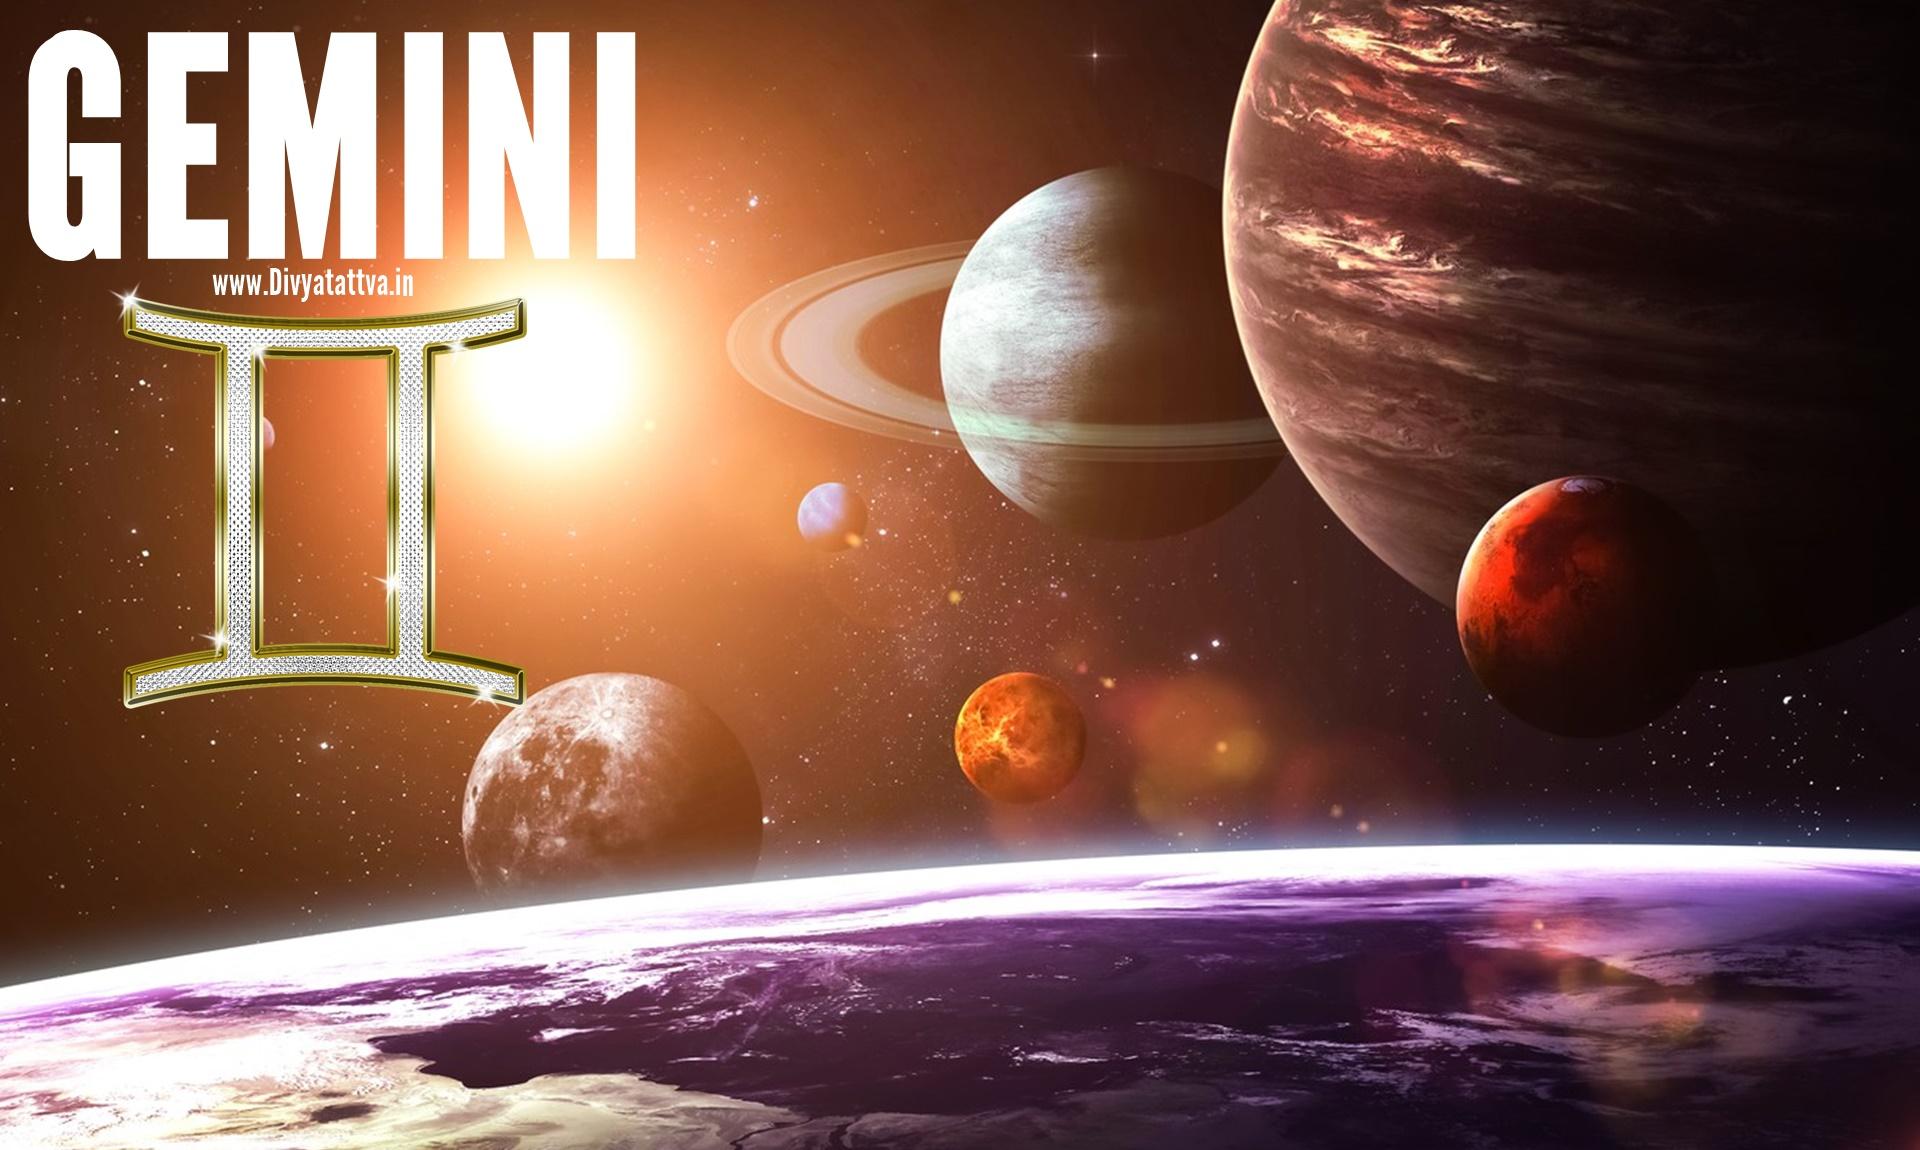 Zodiac Sun Signs Horoscopes Free Gemini Wallpapers Gemini Background Images